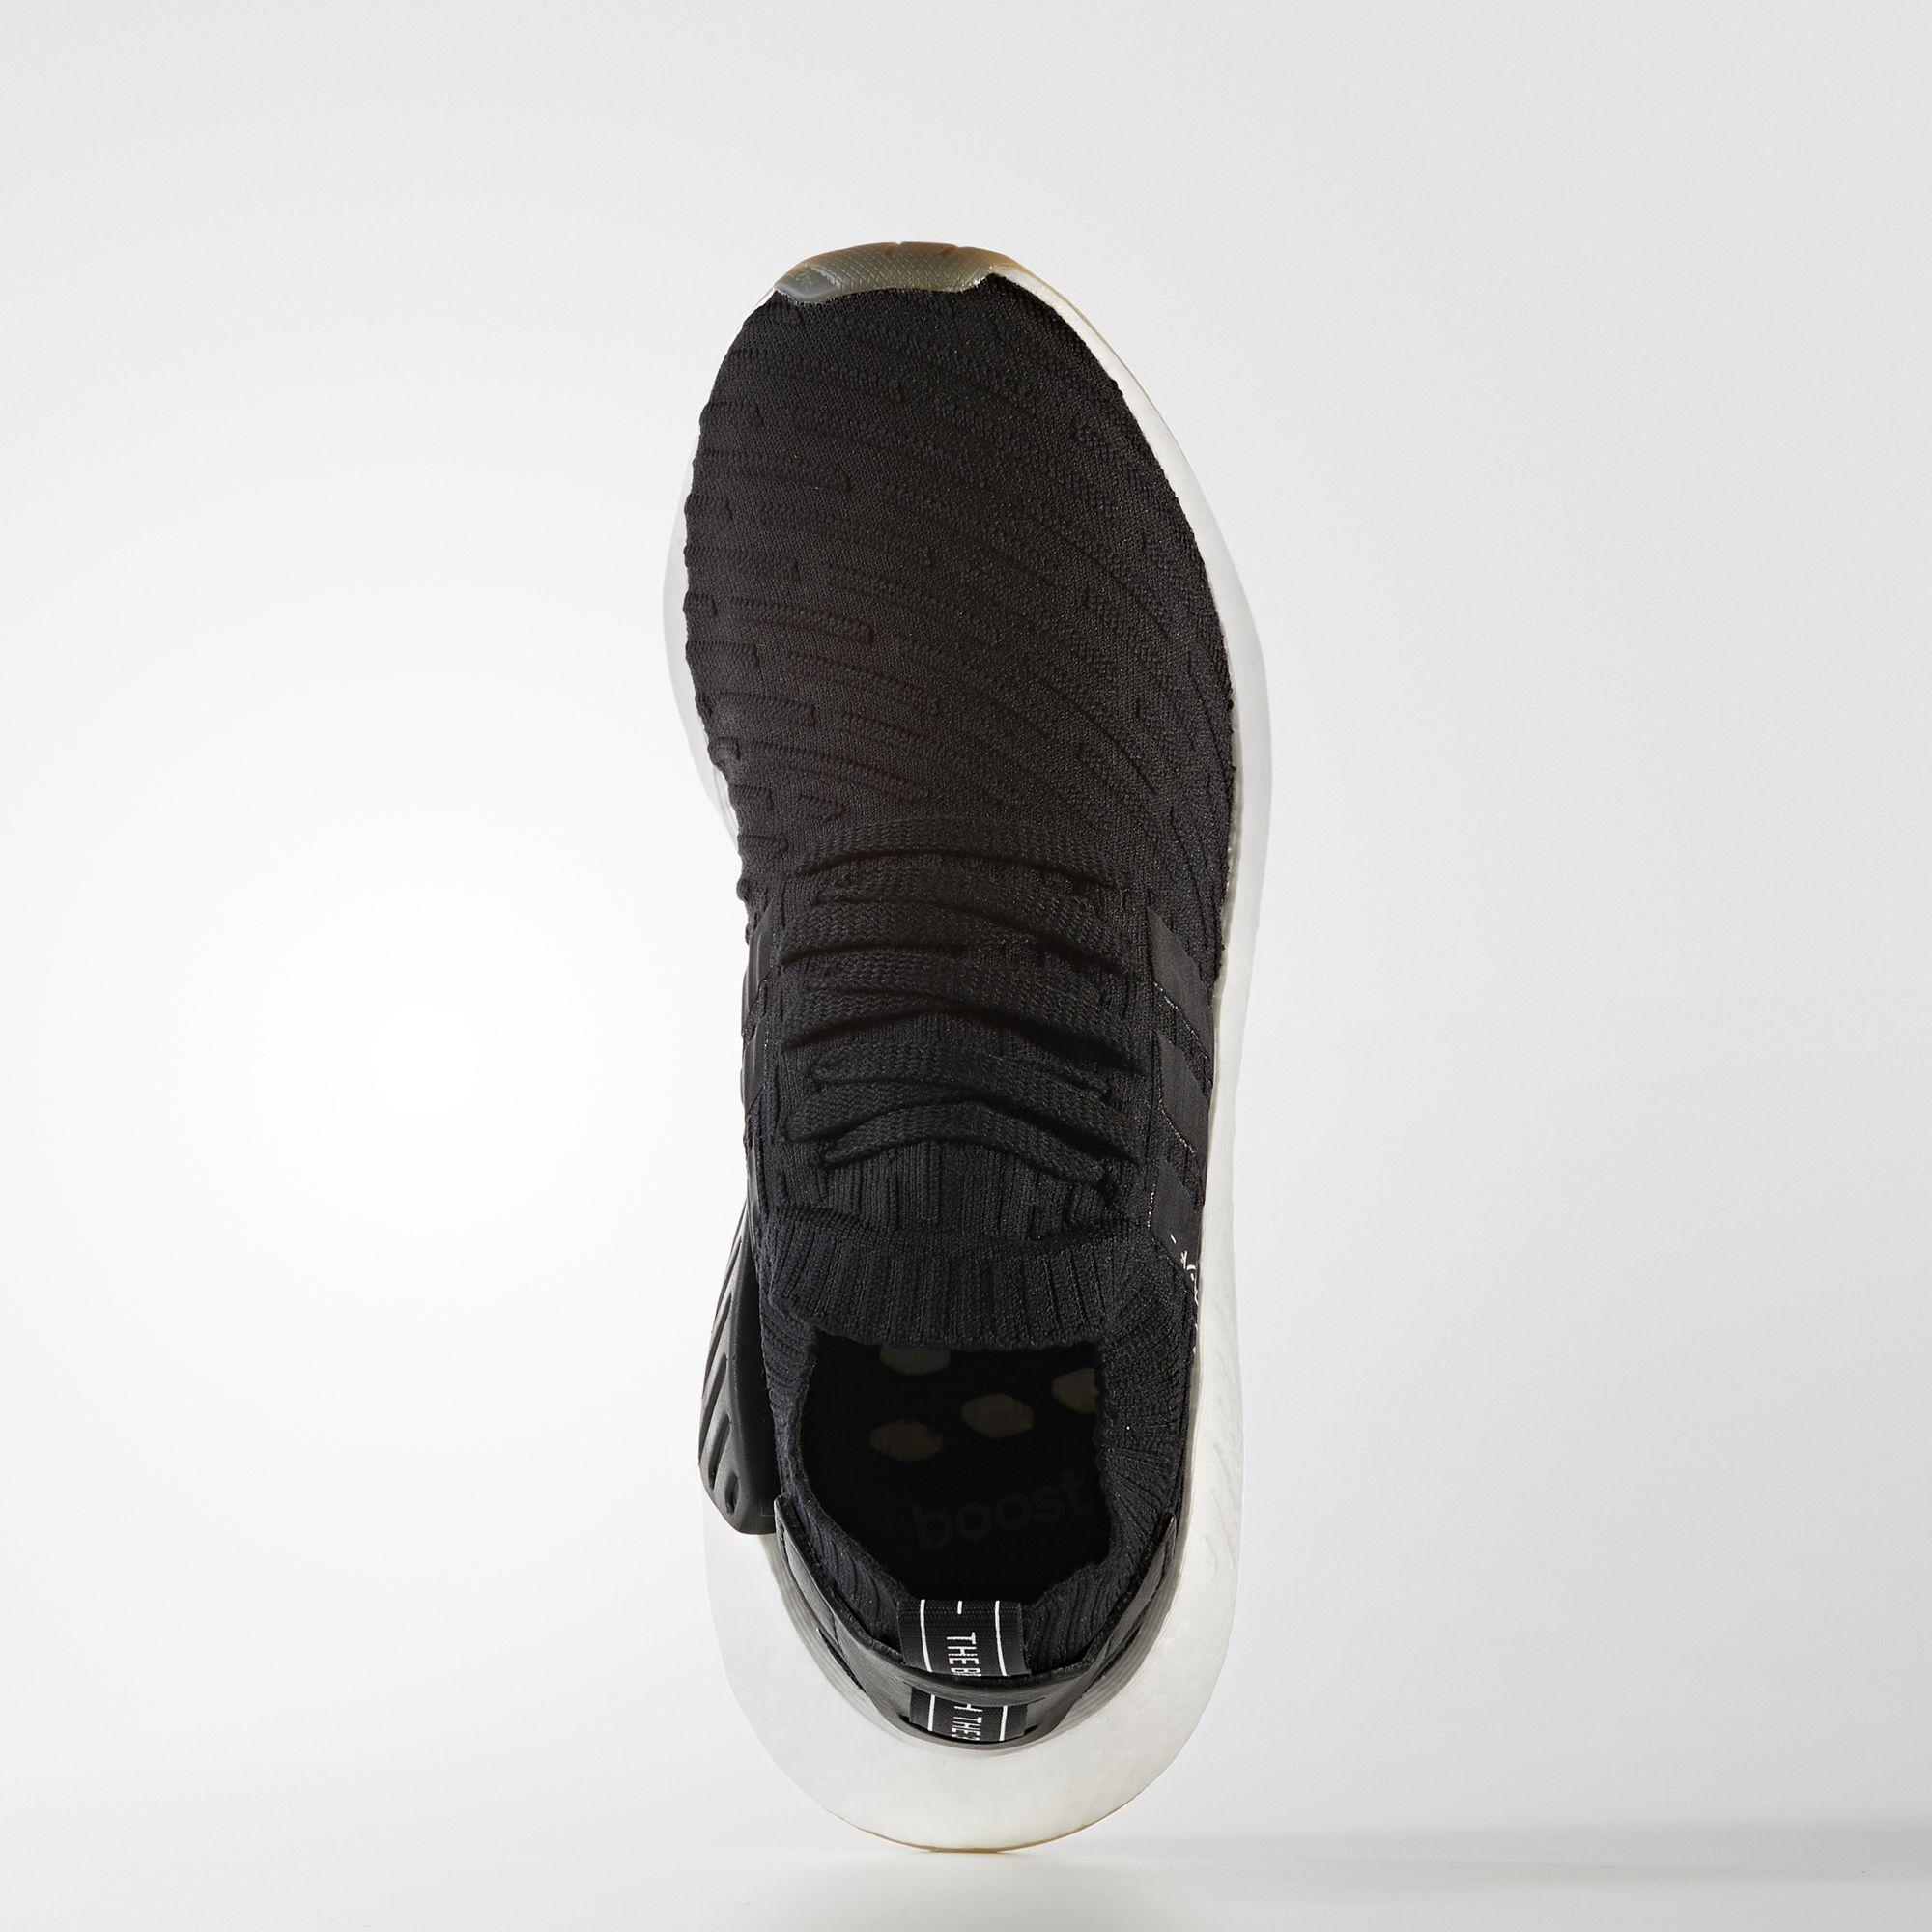 BY9696 adidas NMD R2 Primeknit Core Black 1